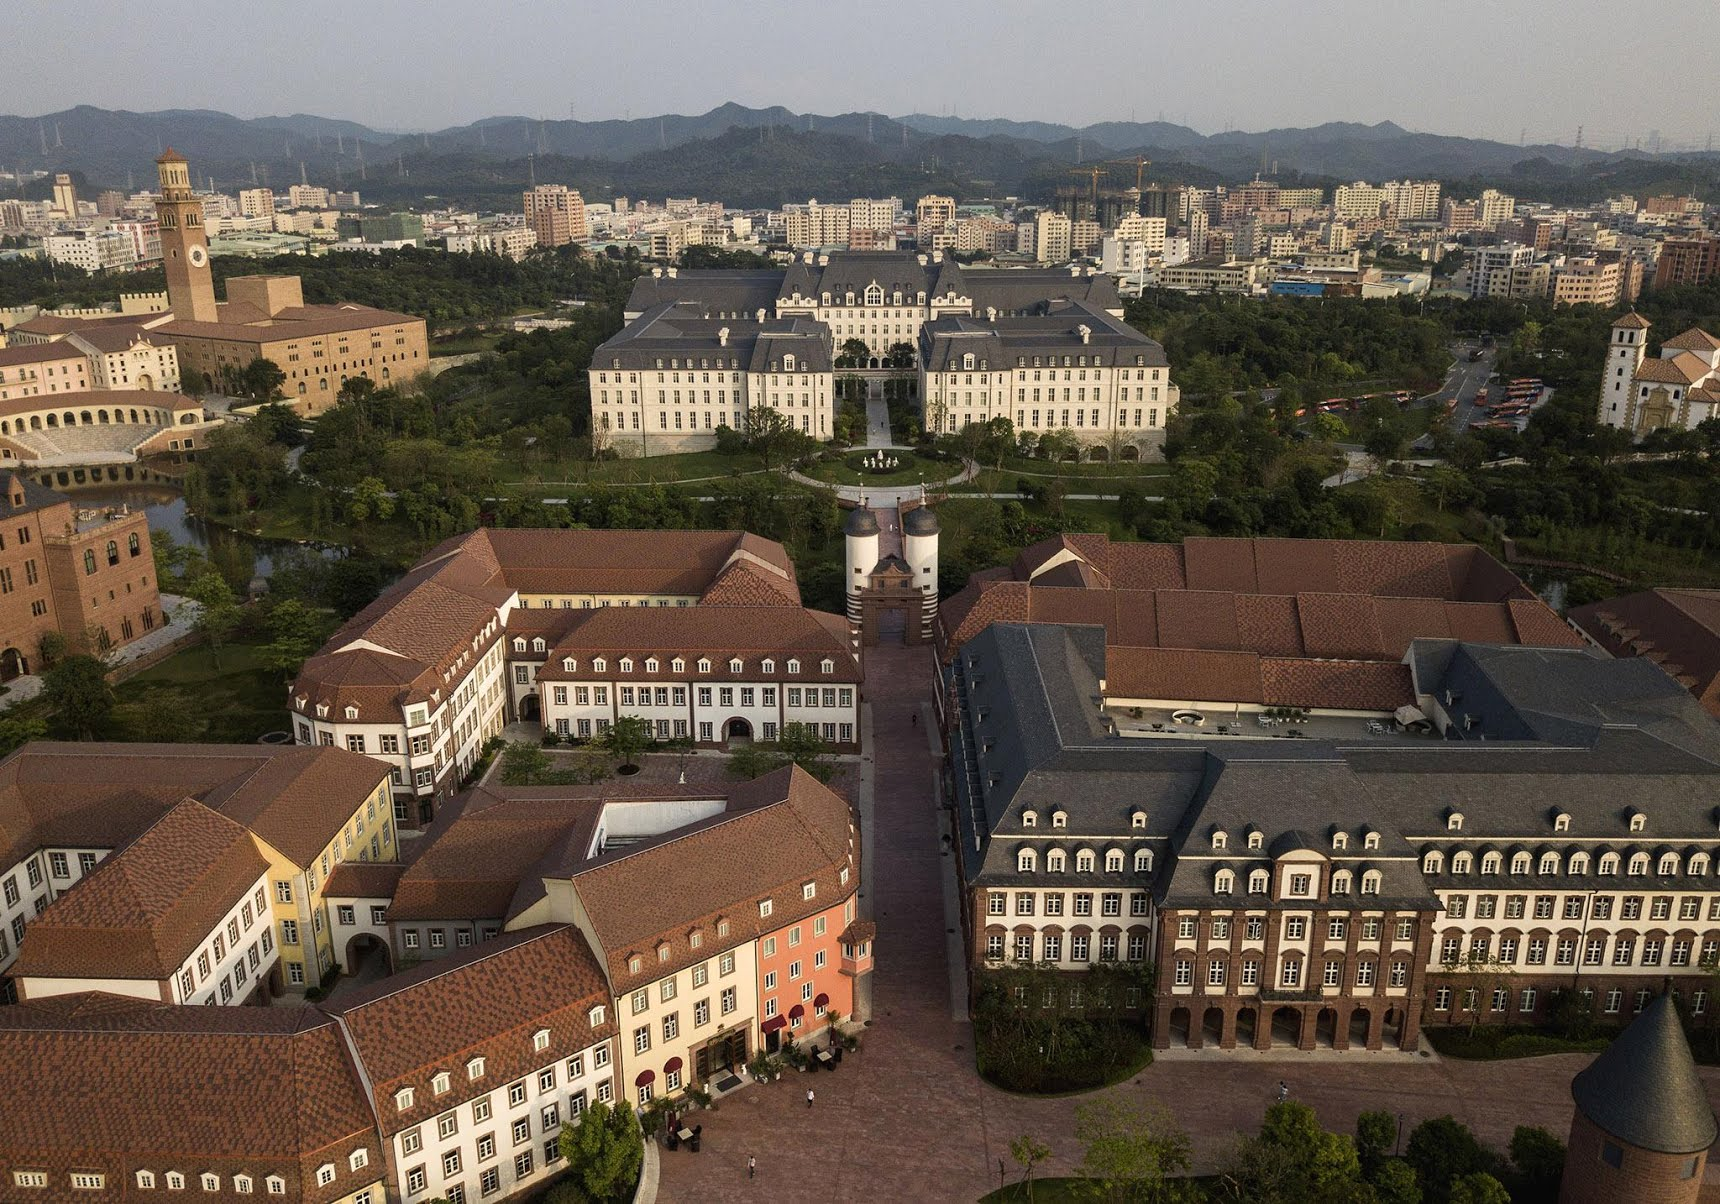 Replika Heidelberg in Huawei City, China